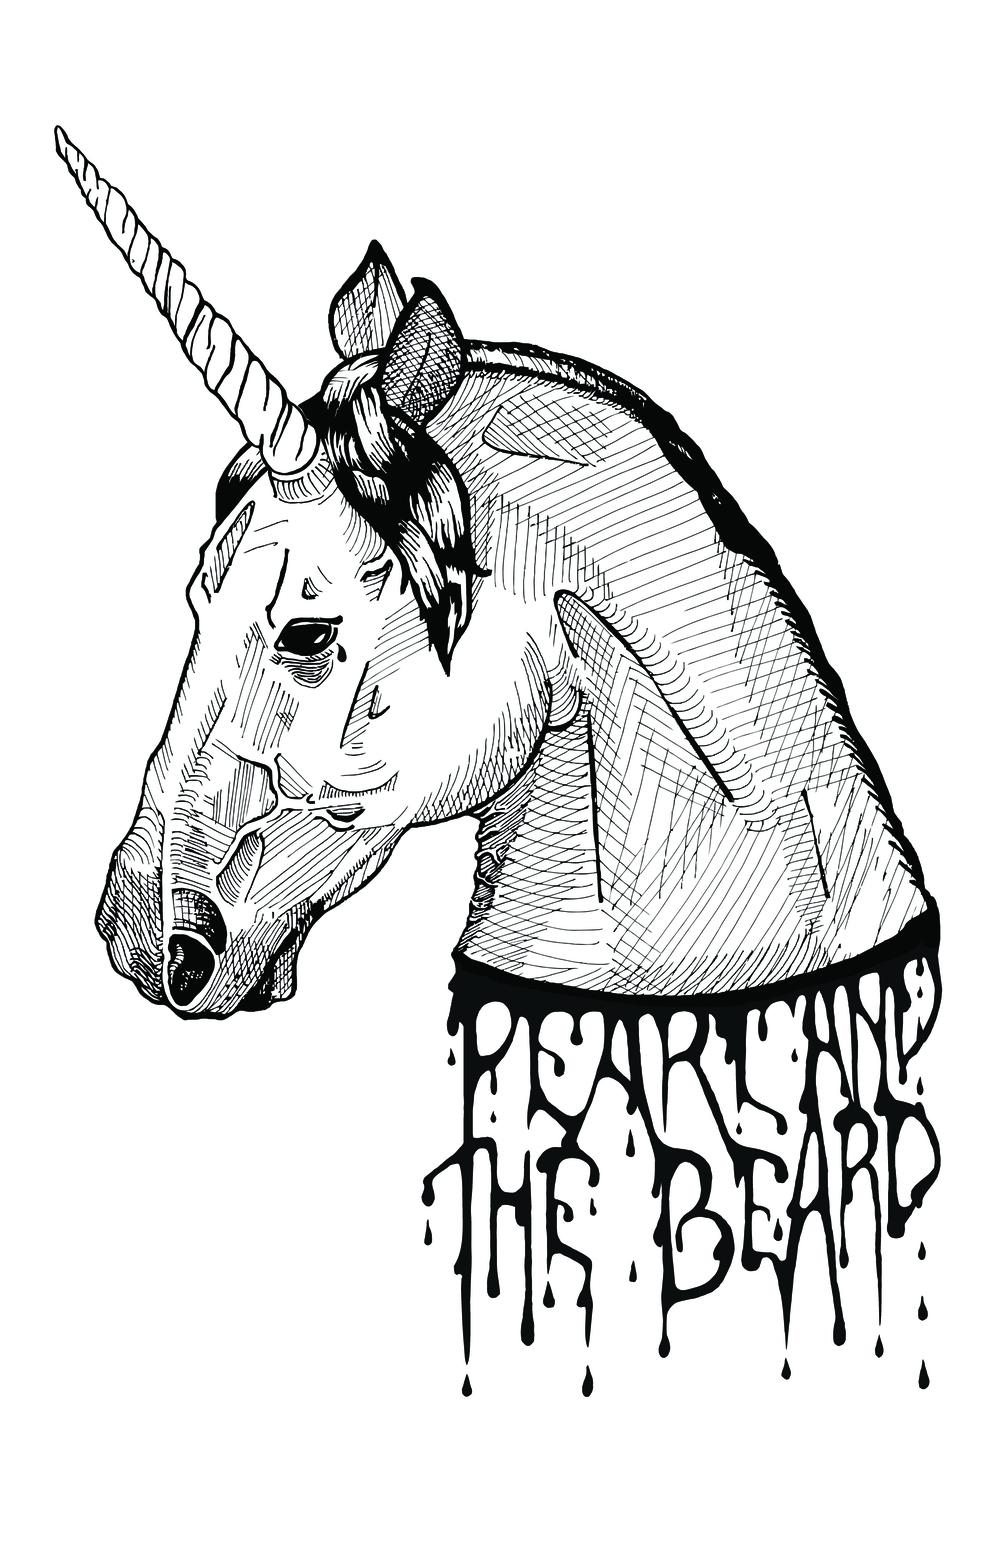 Pearl and the Beard    Tee Shirt Design Collaboration // Illustration